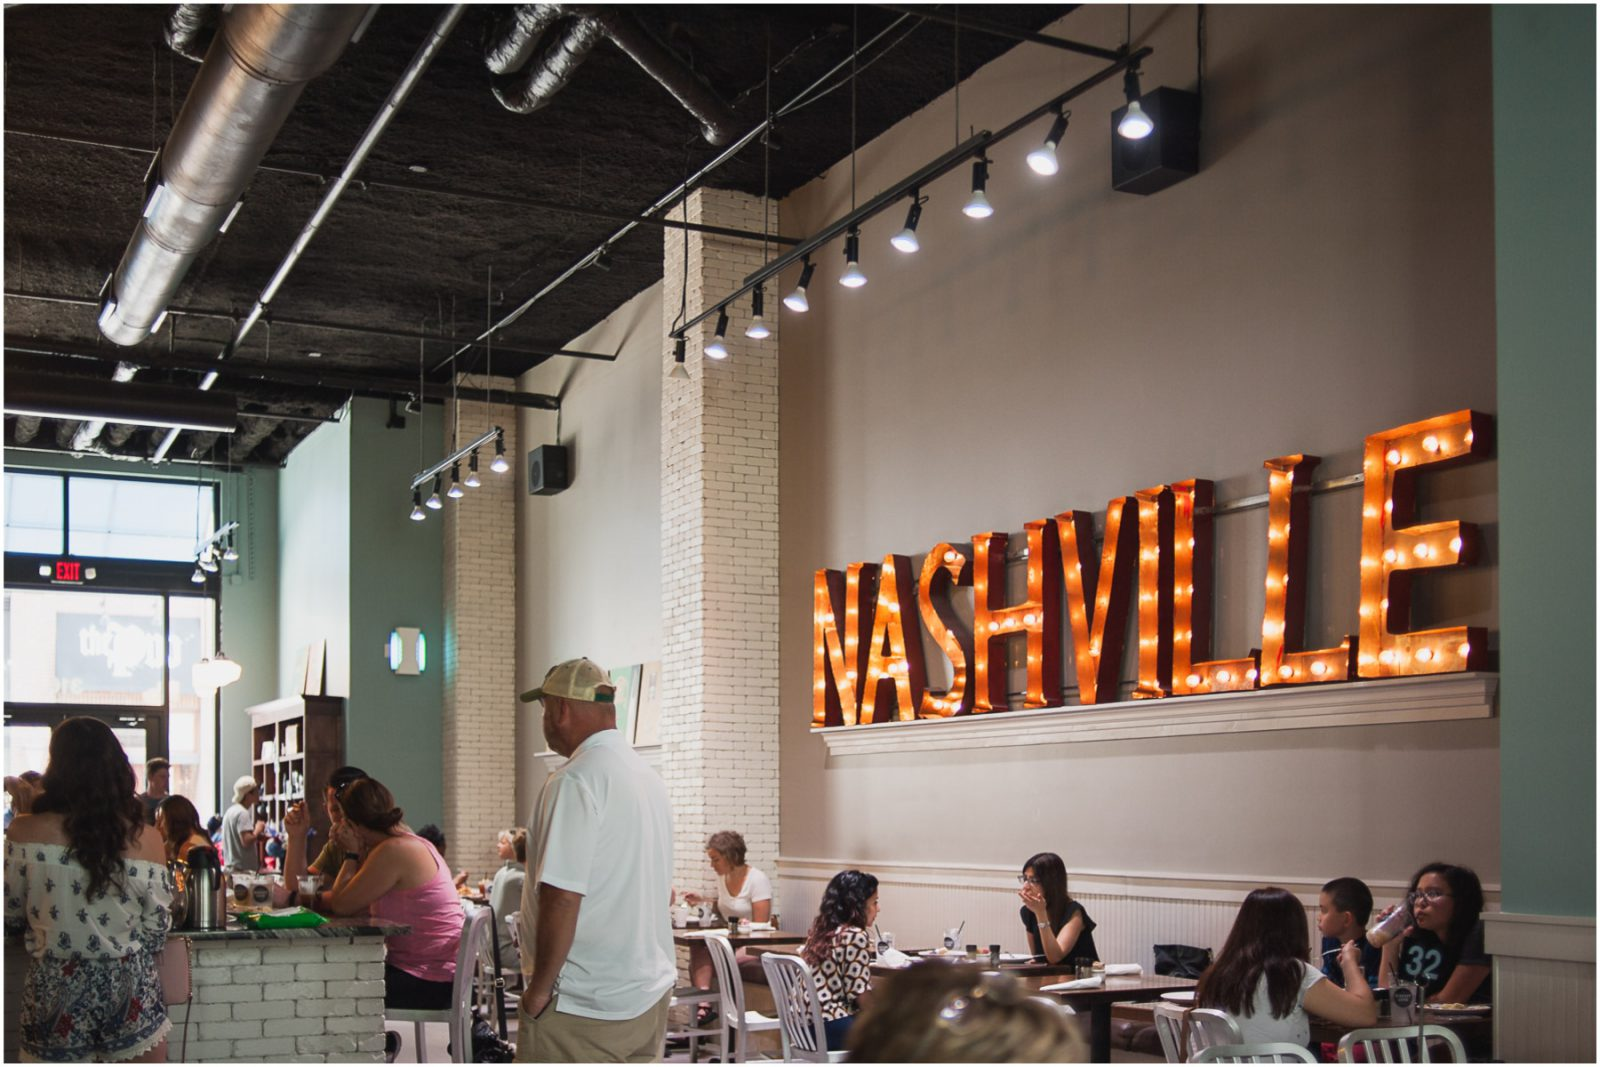 Nashville_TN_DAY-1_3.jpg